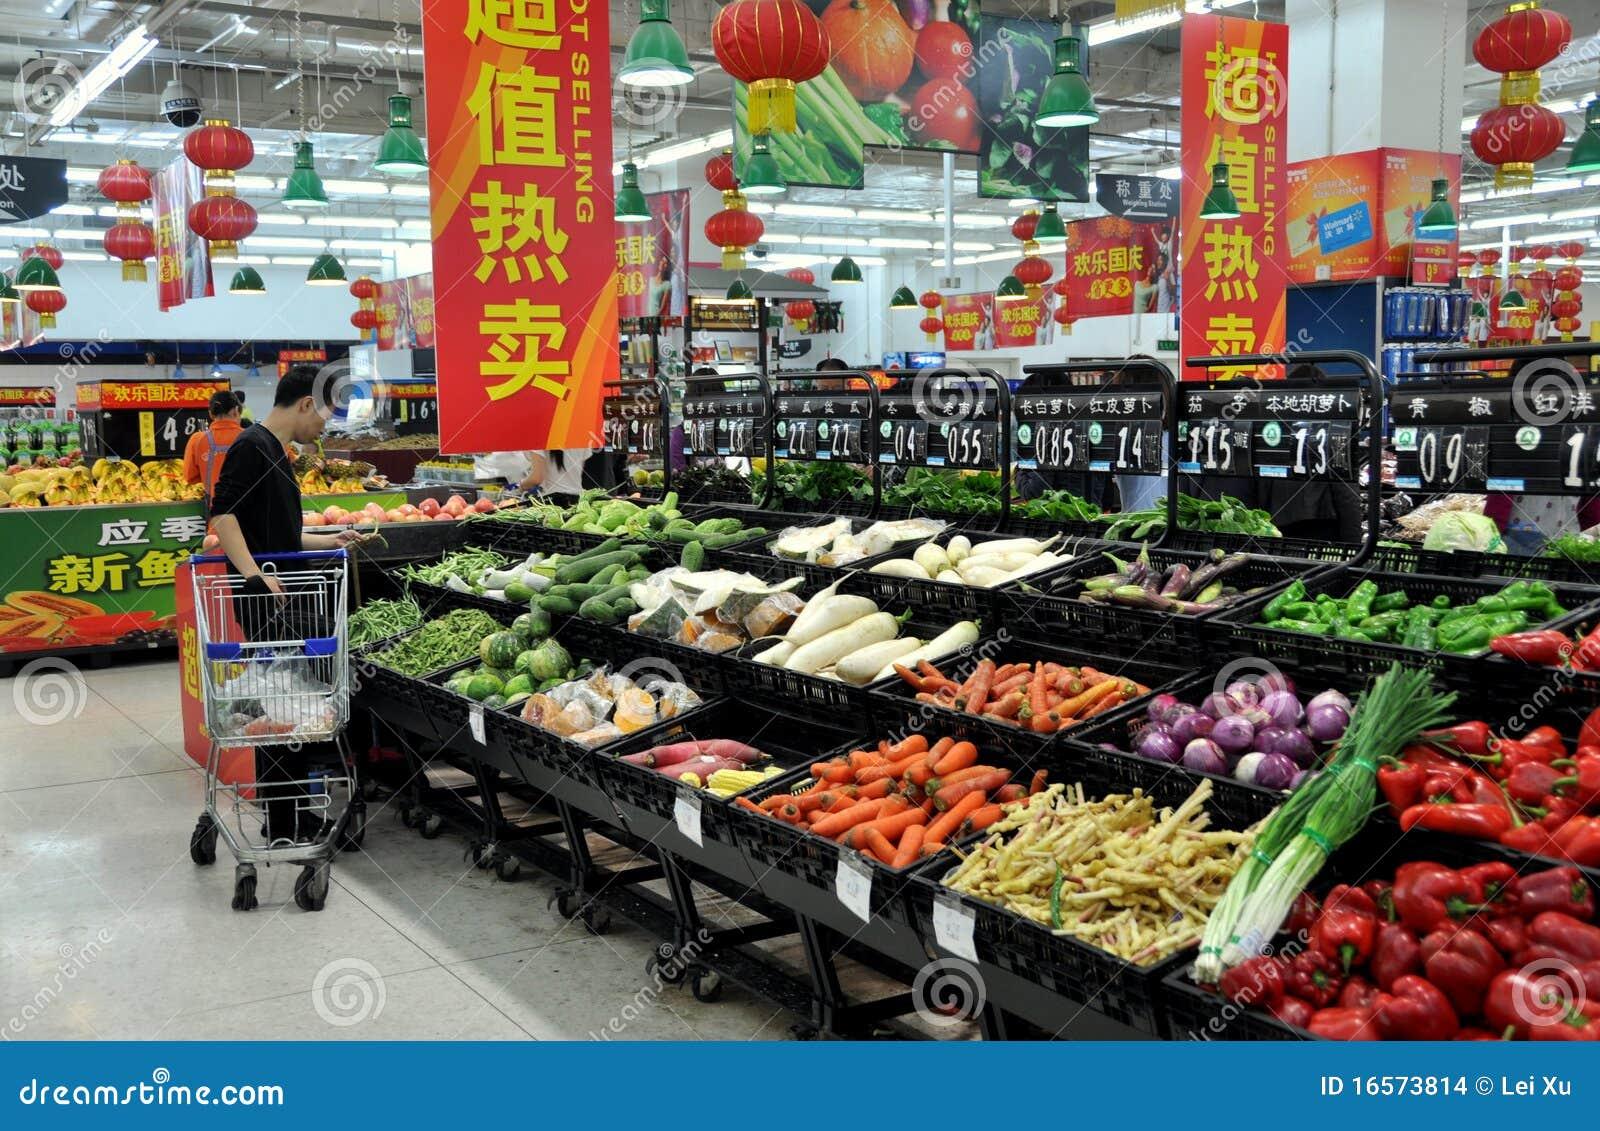 Walmart Corporate Contact >> Chengdu, China: Walmart Supermarket Editorial Stock Image ...